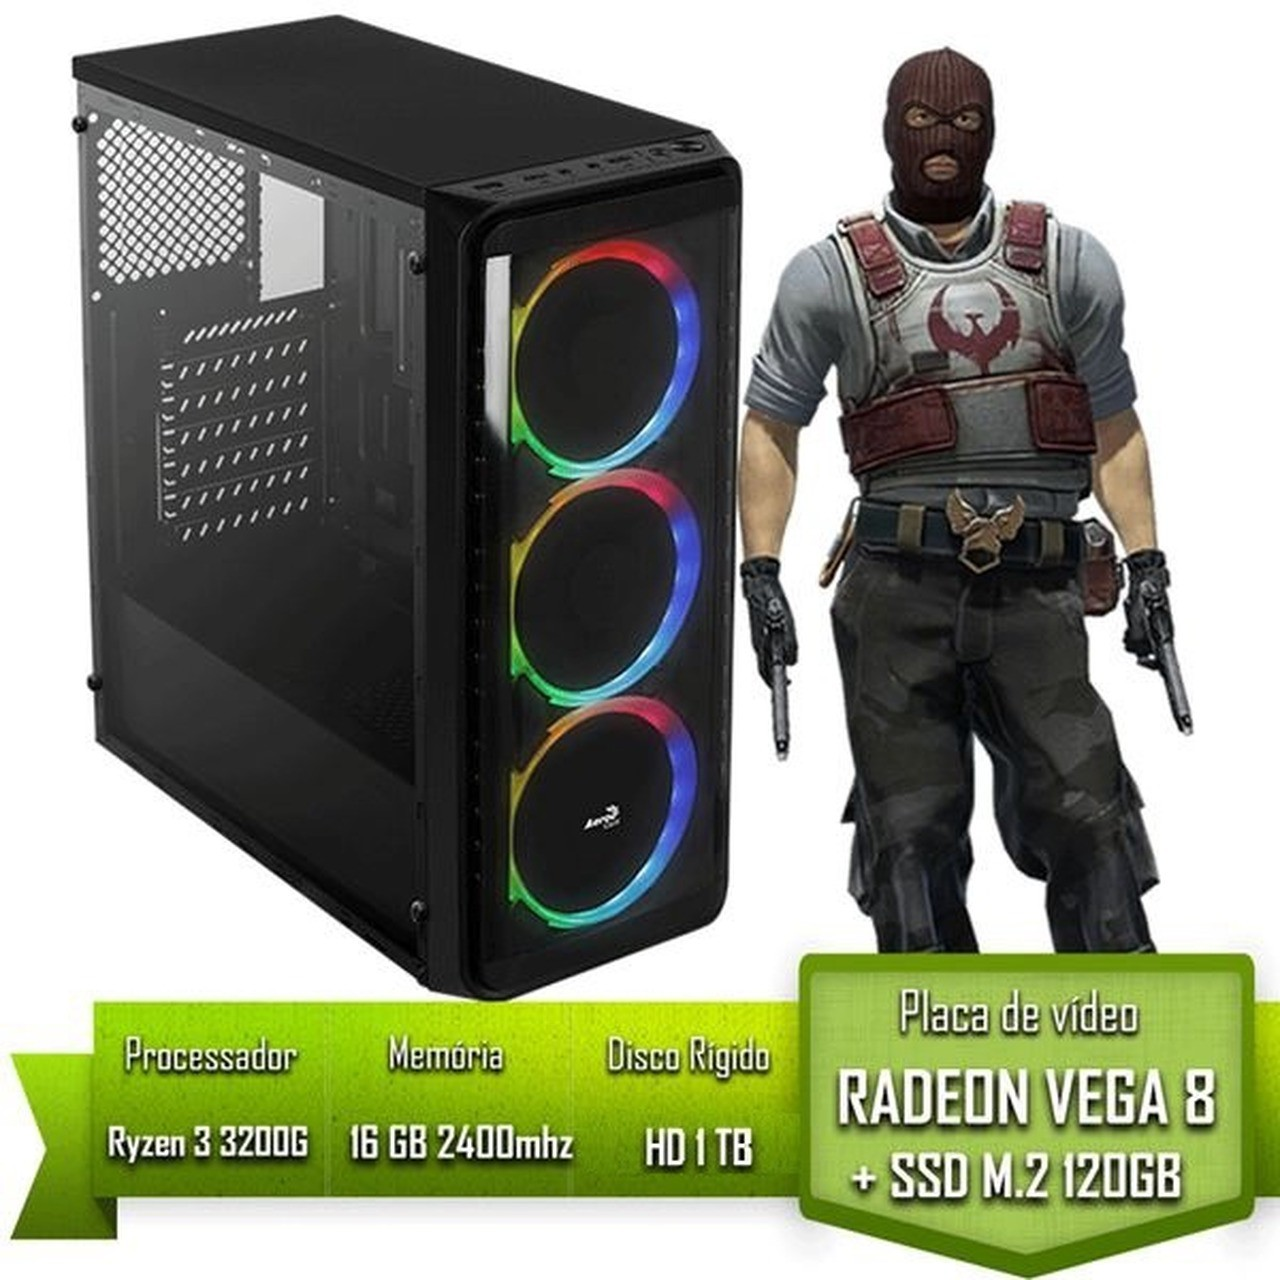 PC GAMER AMD RYZEN 3 3200G / 16GB 2400MHZ / SSD 120GB M.2 /HD 1TB